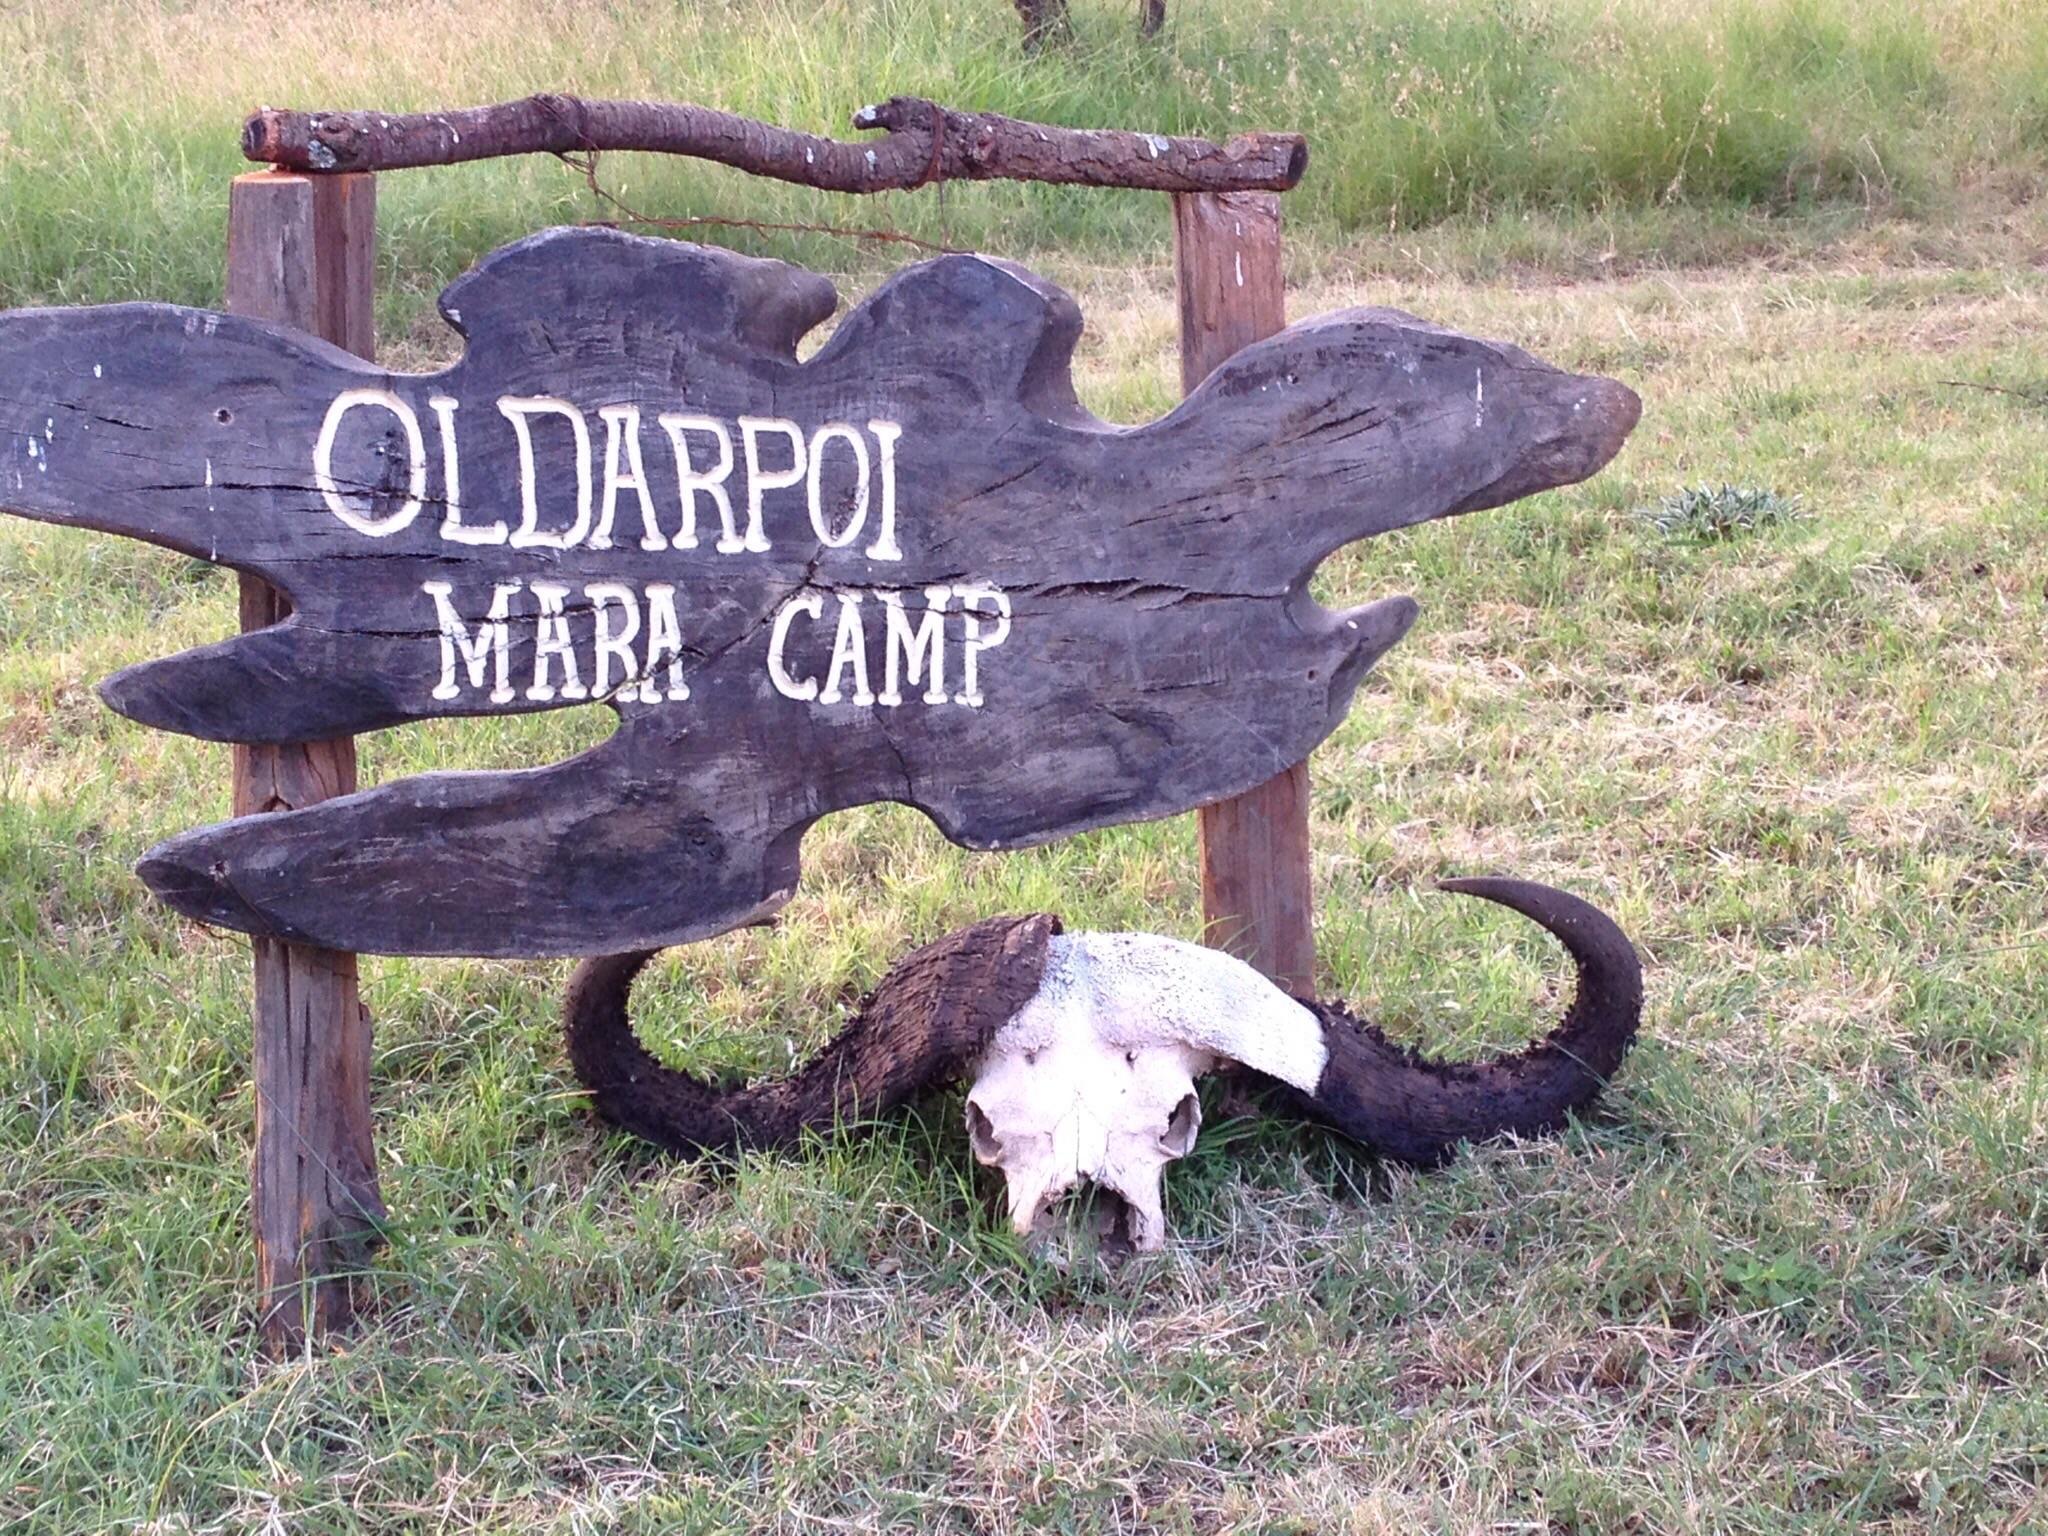 Oldarpoi Mara Camp